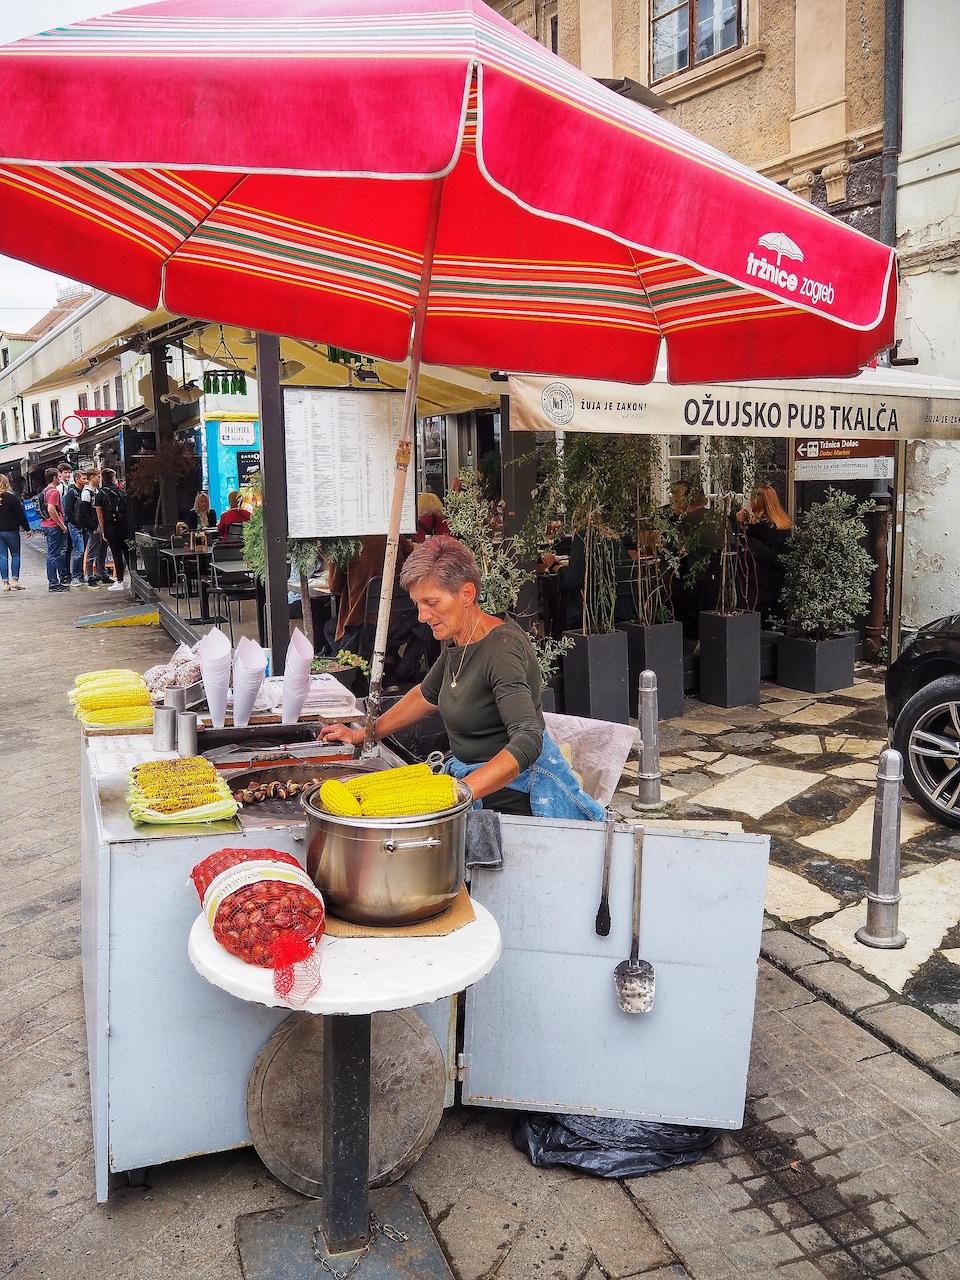 Stedentrip Zagreb - tips - kroatie